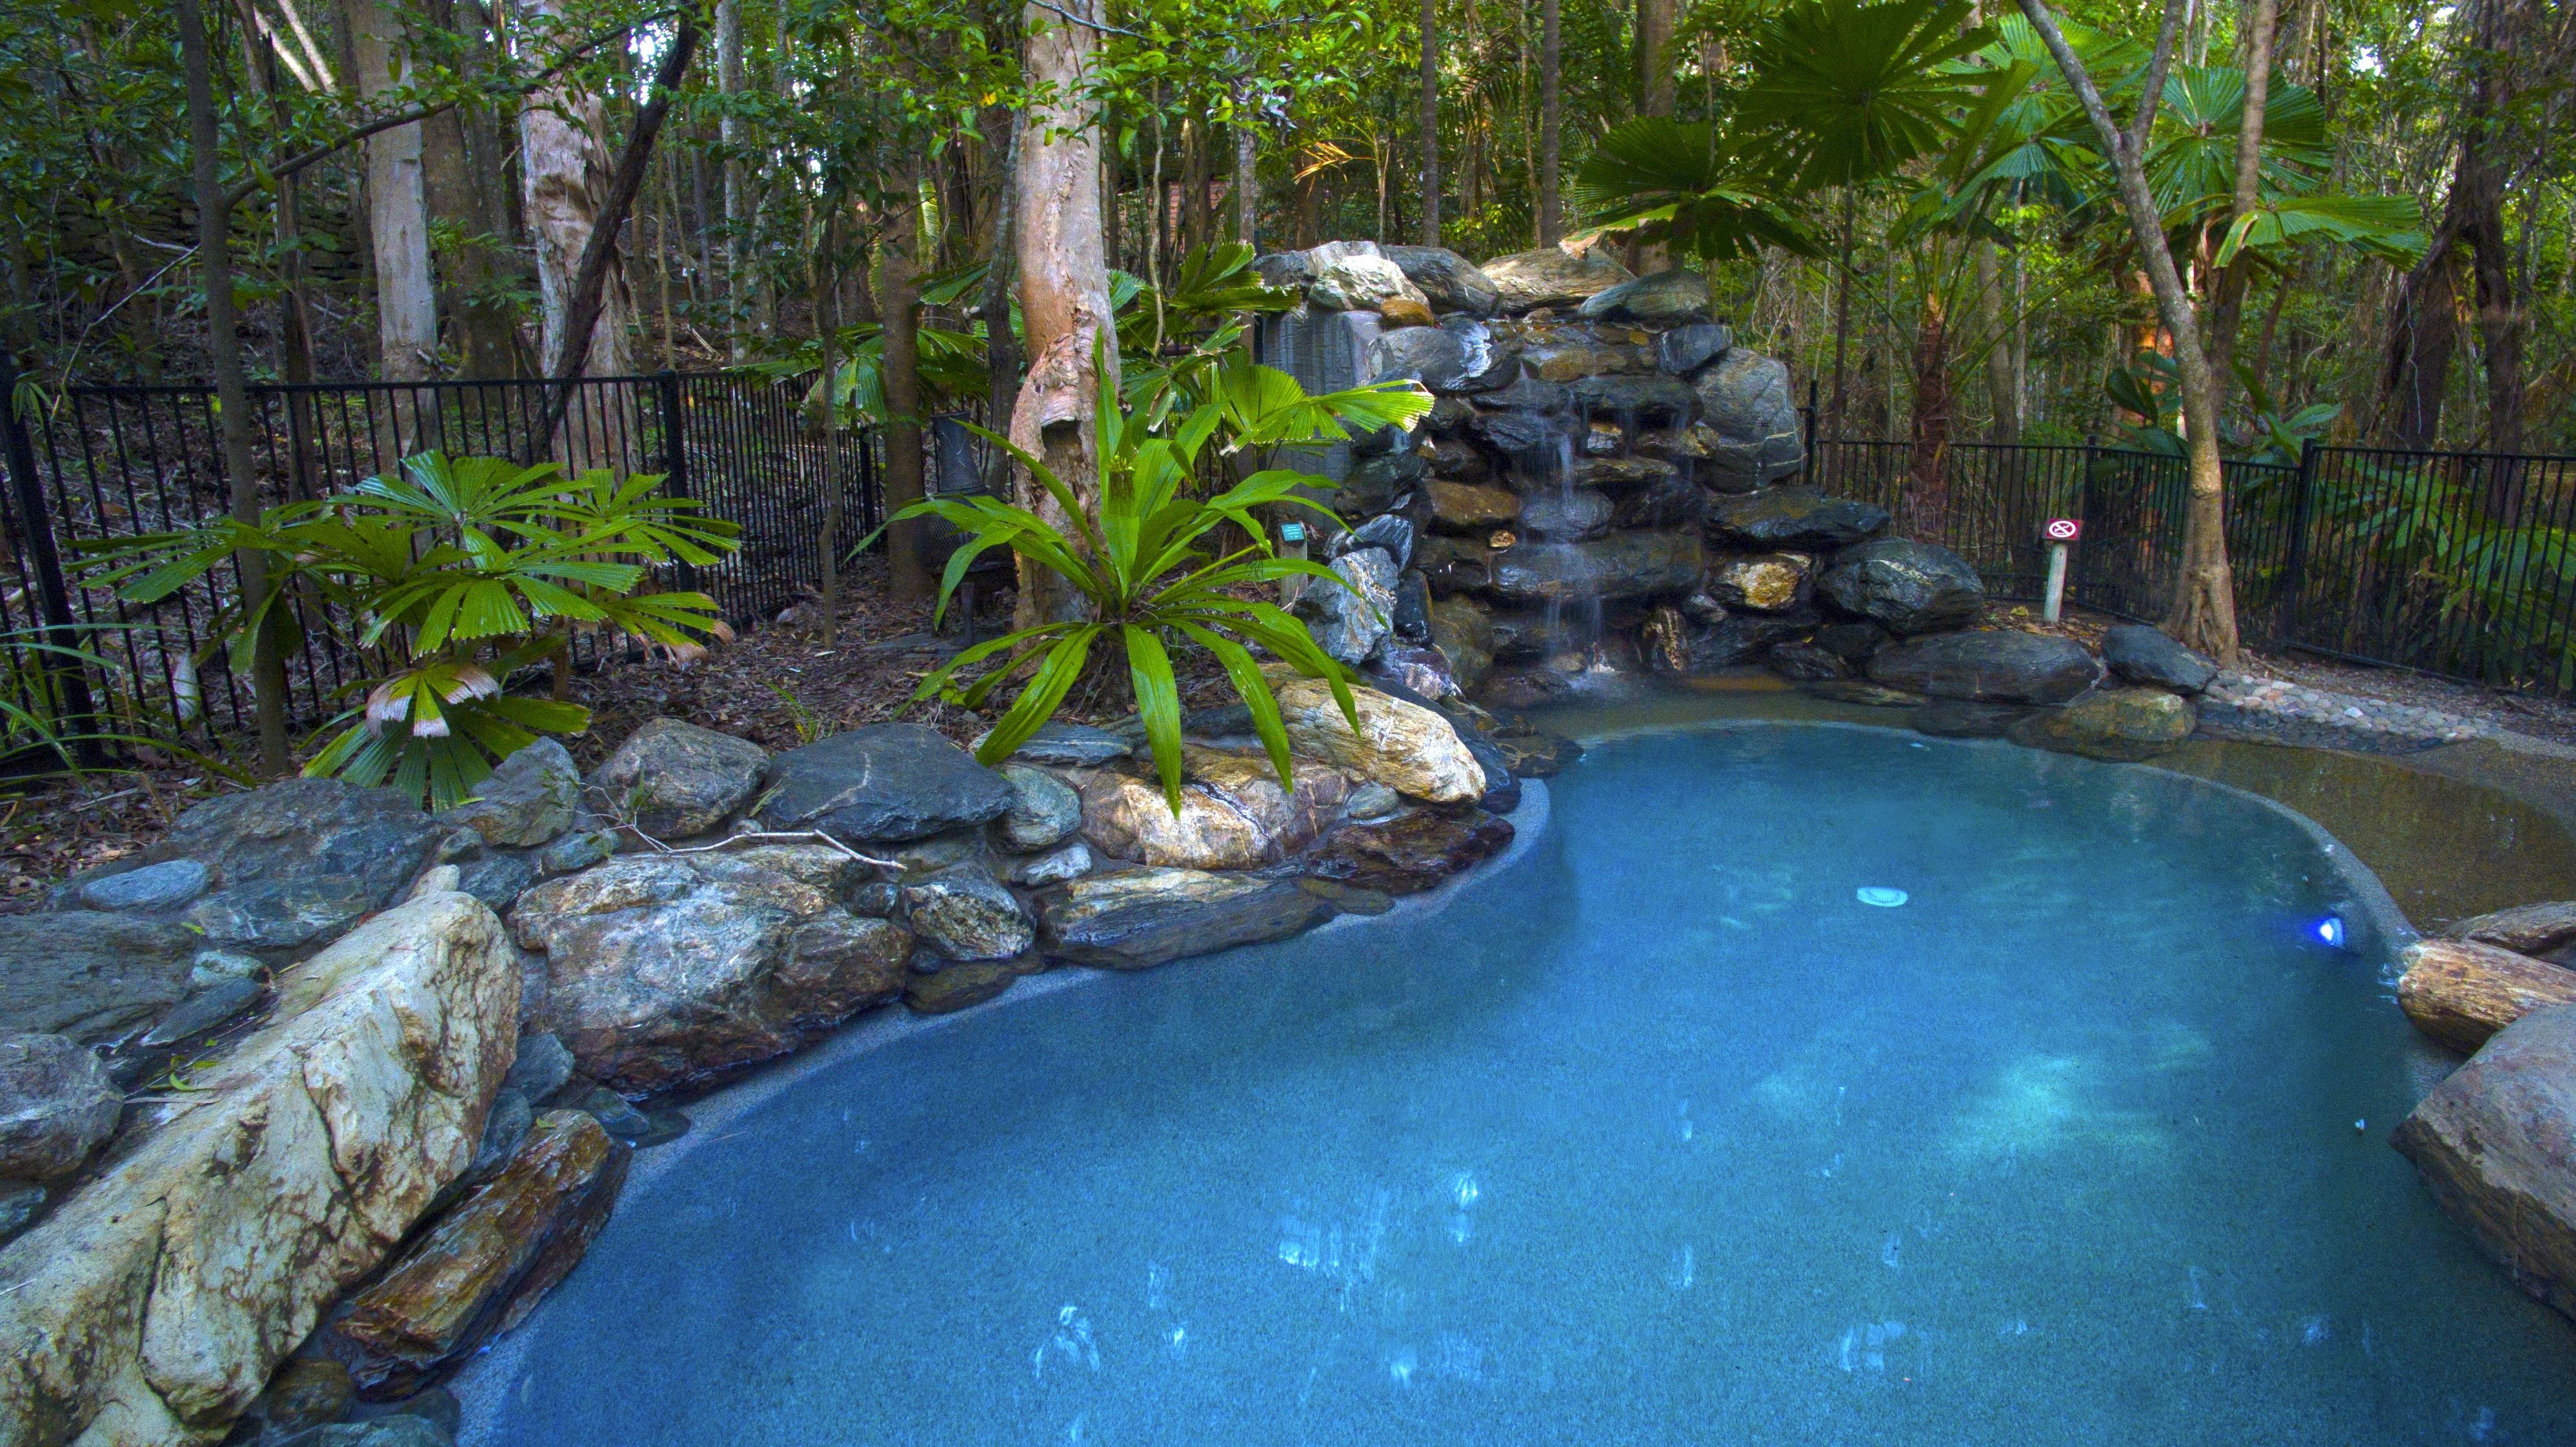 http://www.thalabeach.com.au/wp-content/uploads/2010/07/Thala_Beach_Nature_Reserve_2016__188.jpg